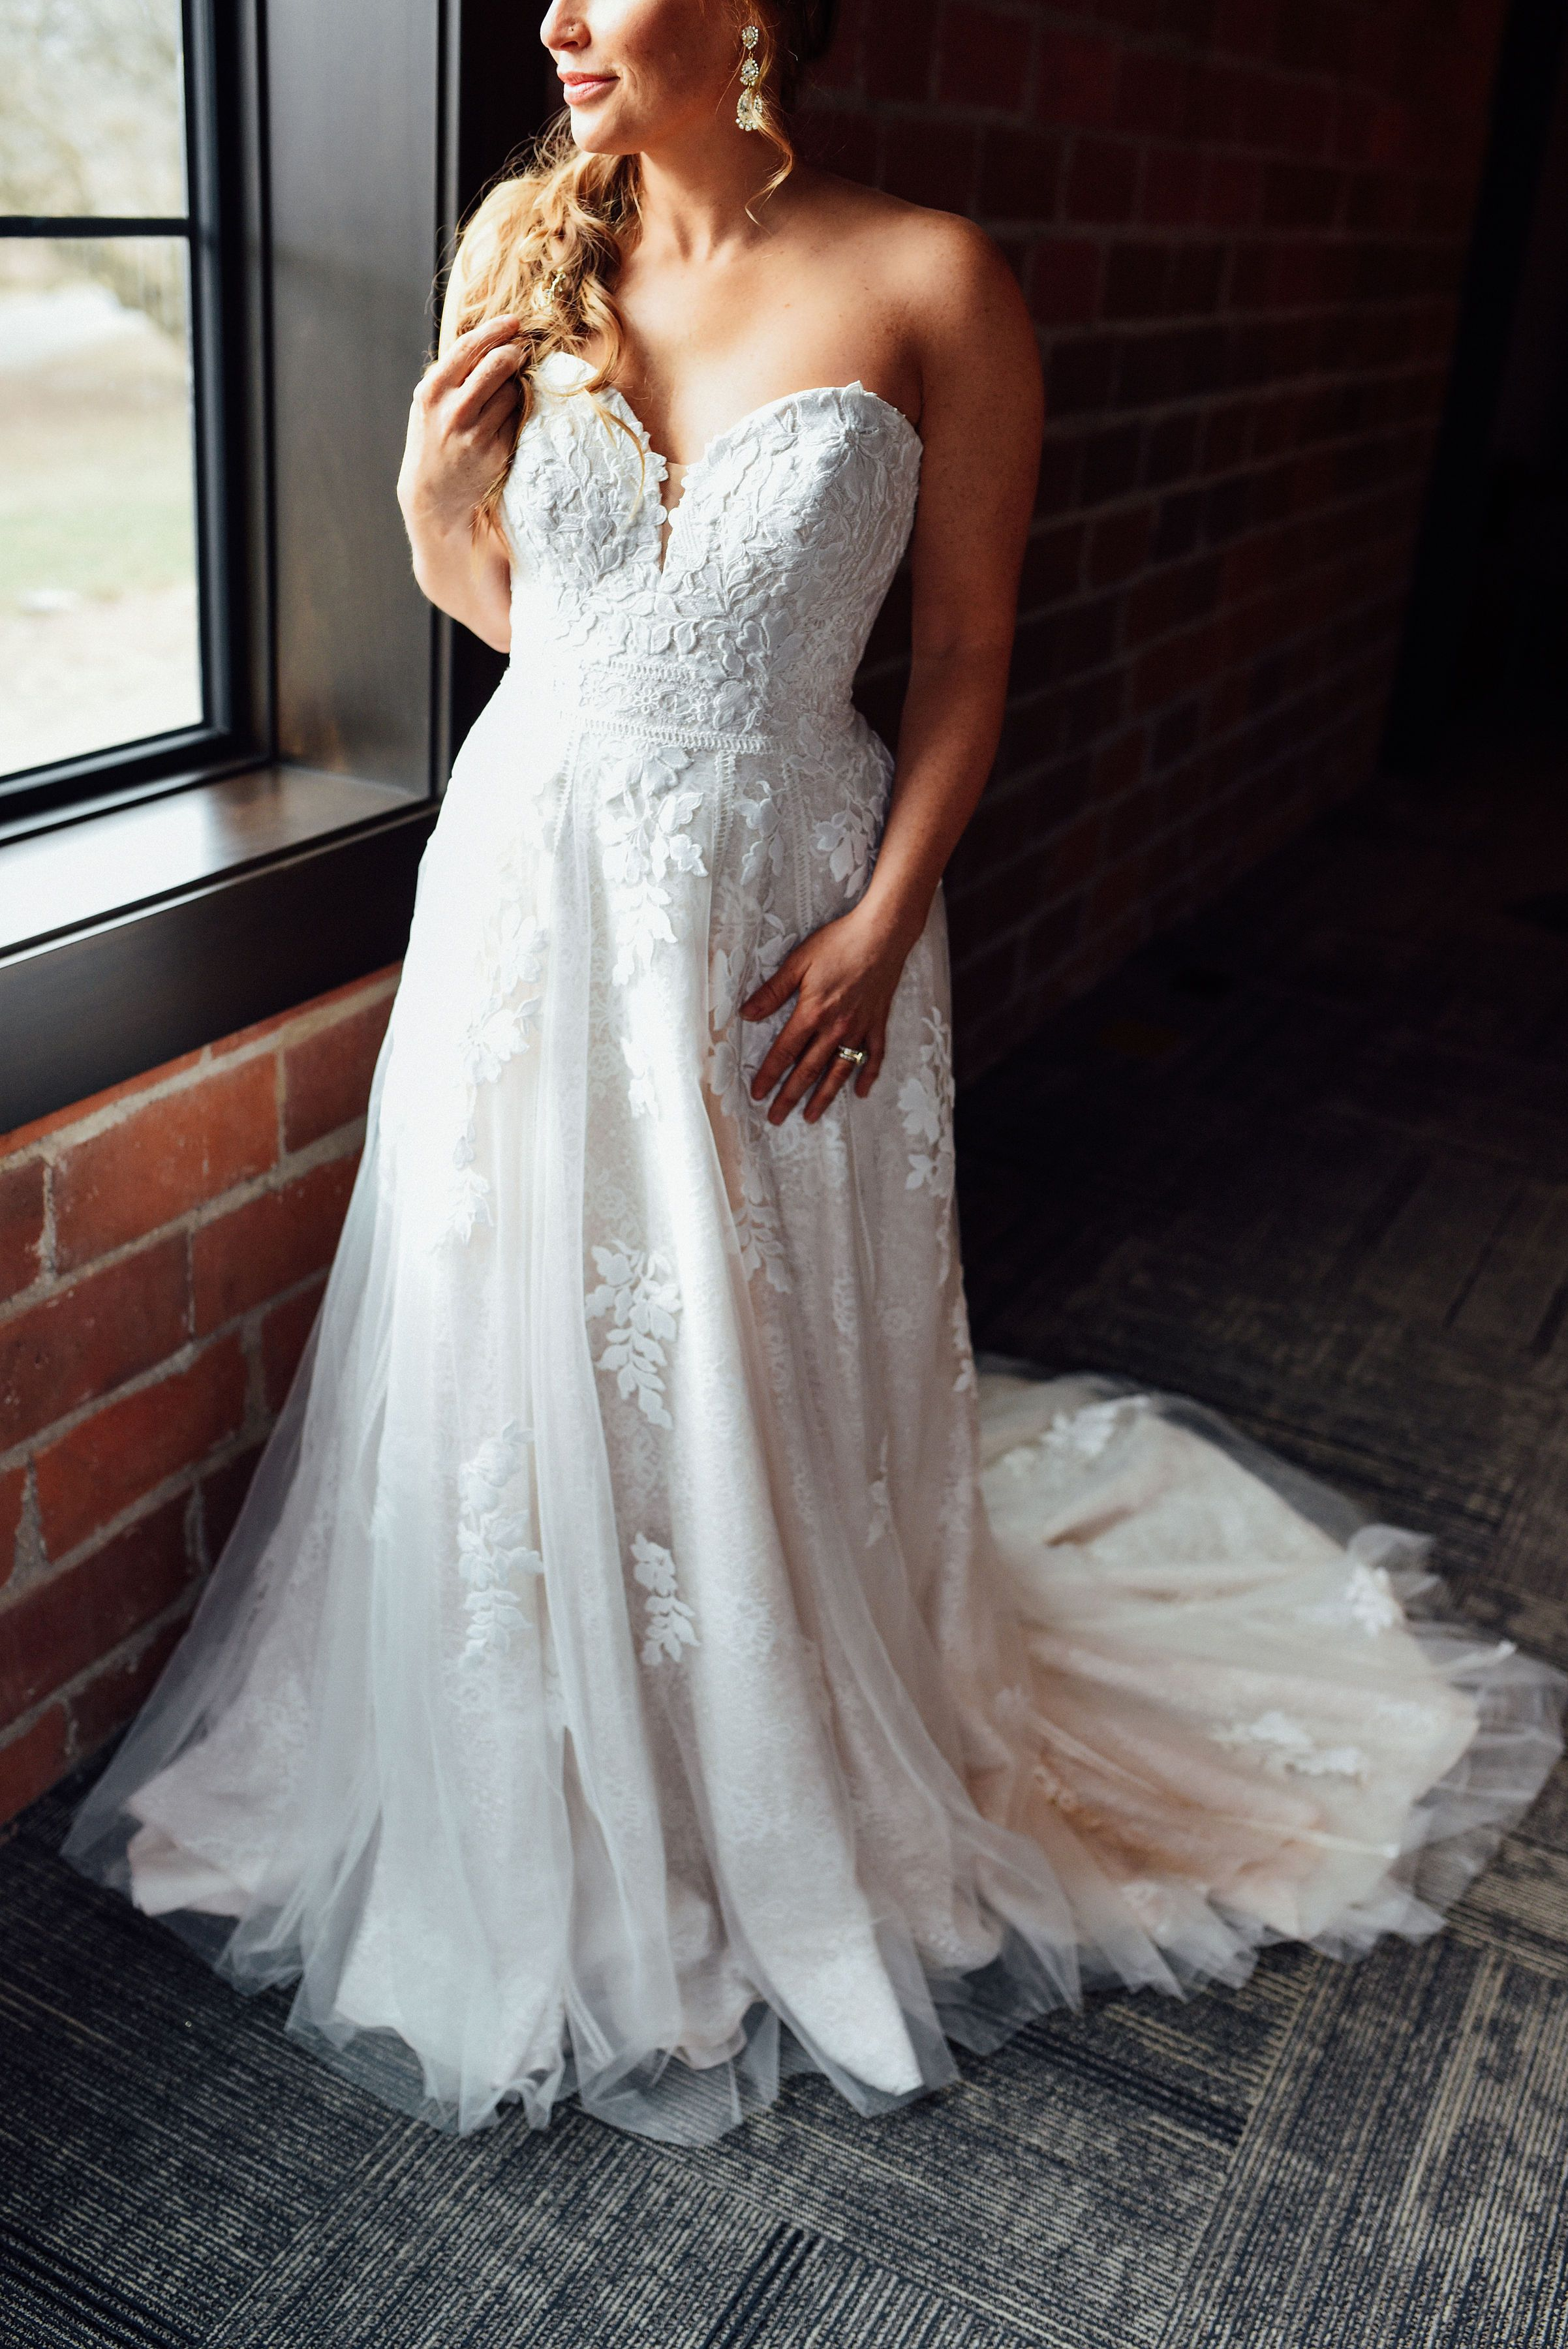 Mina Starsiak From Hgtv S Good Bones In A Gorgeous Essense Of Australia Essence Of Australia Wedding Dress Essense Of Australia Wedding Dresses Wedding Dresses [ 3600 x 2403 Pixel ]